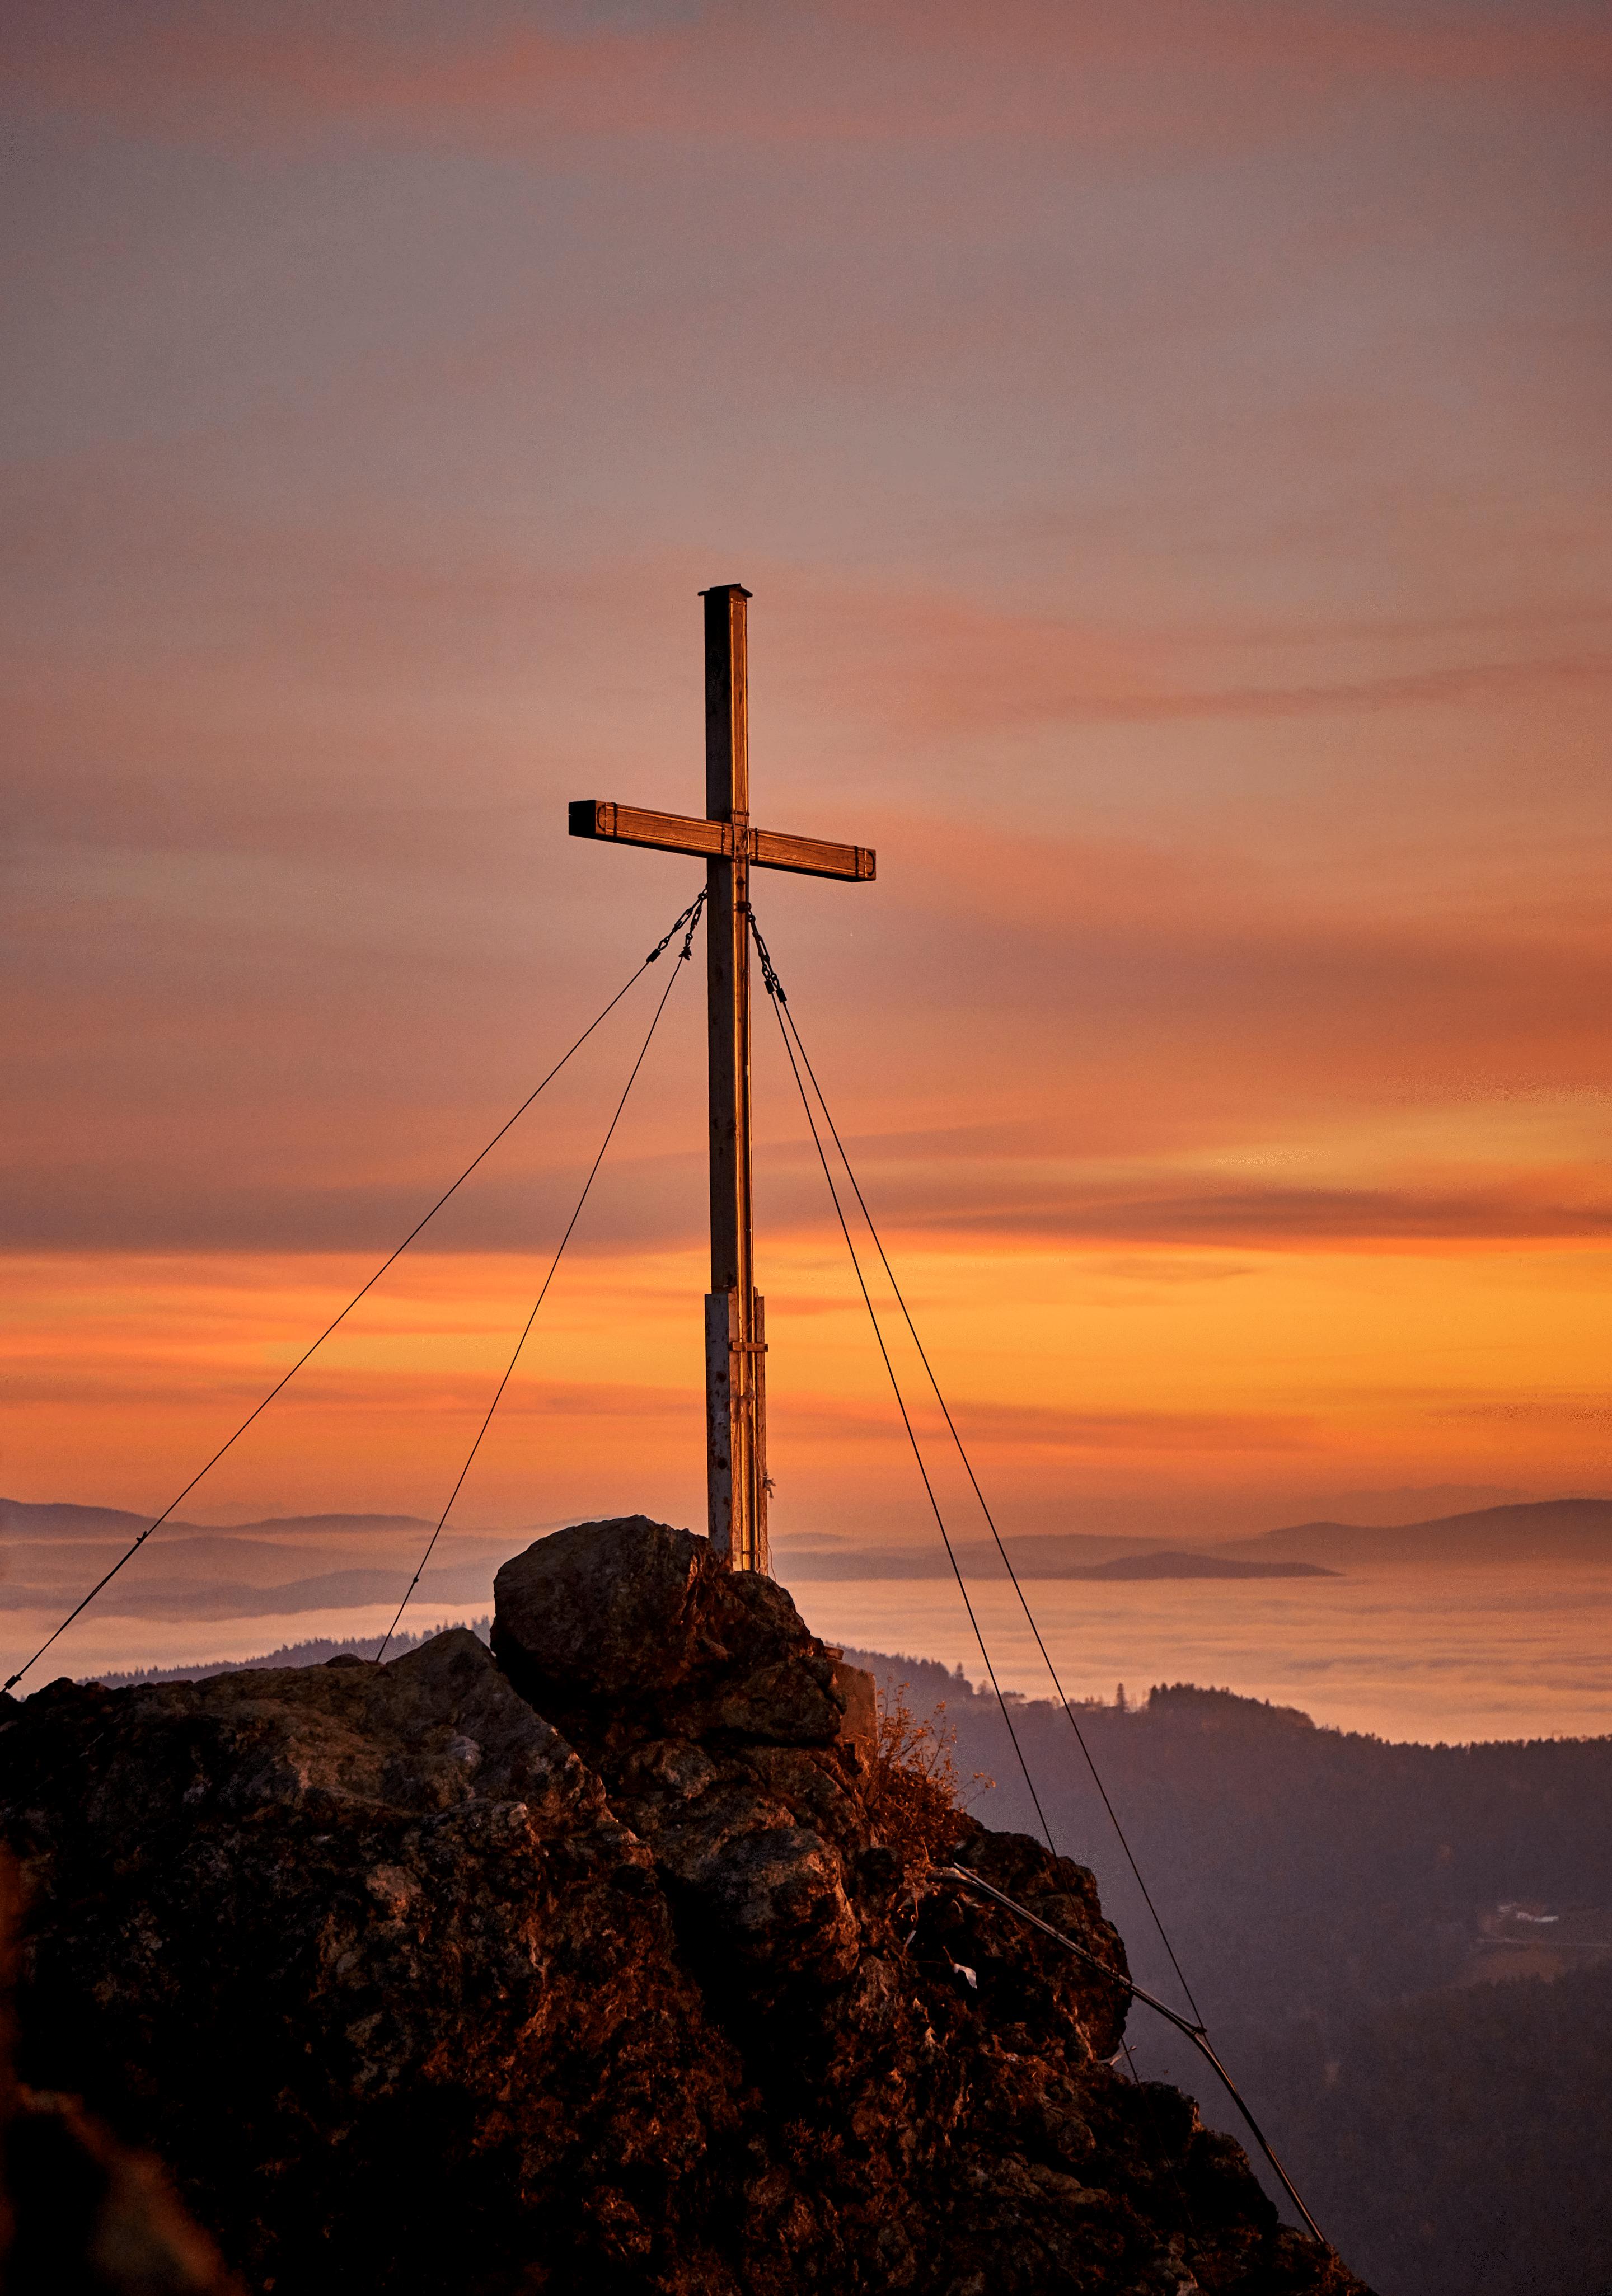 Sonnenuntergang am Silberberg